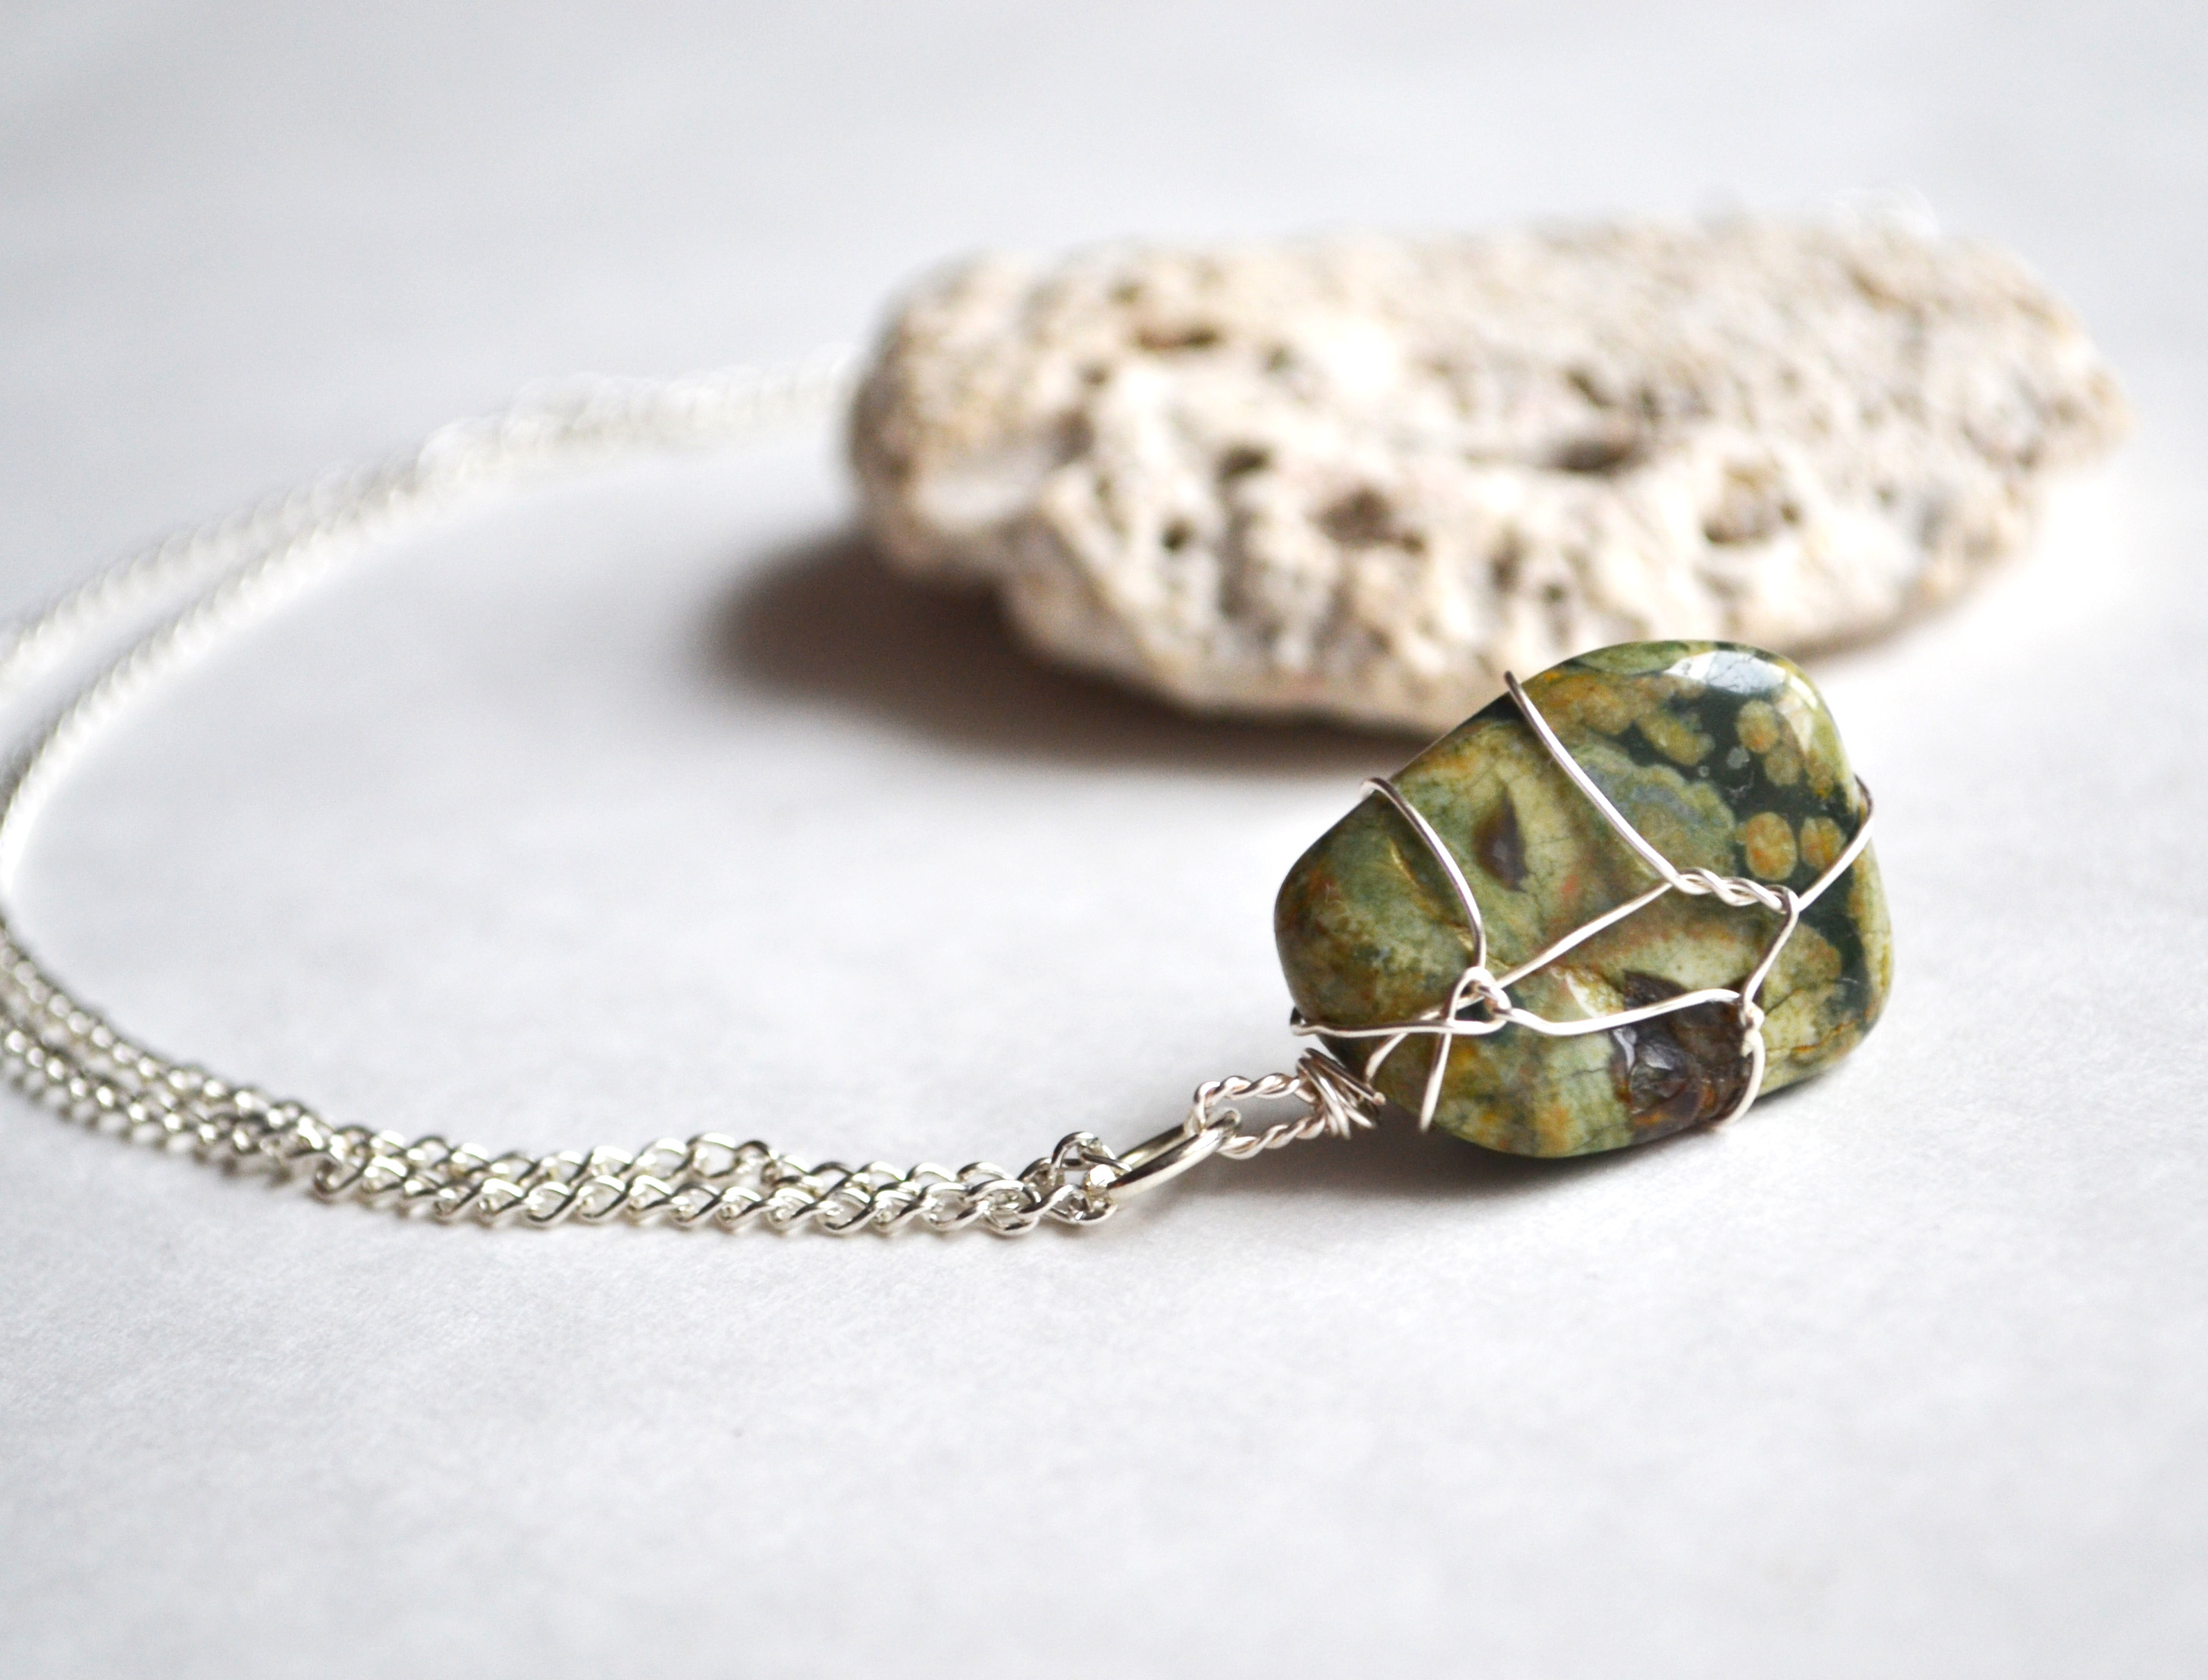 Rainforest Jasper Wire wrapped Pendant